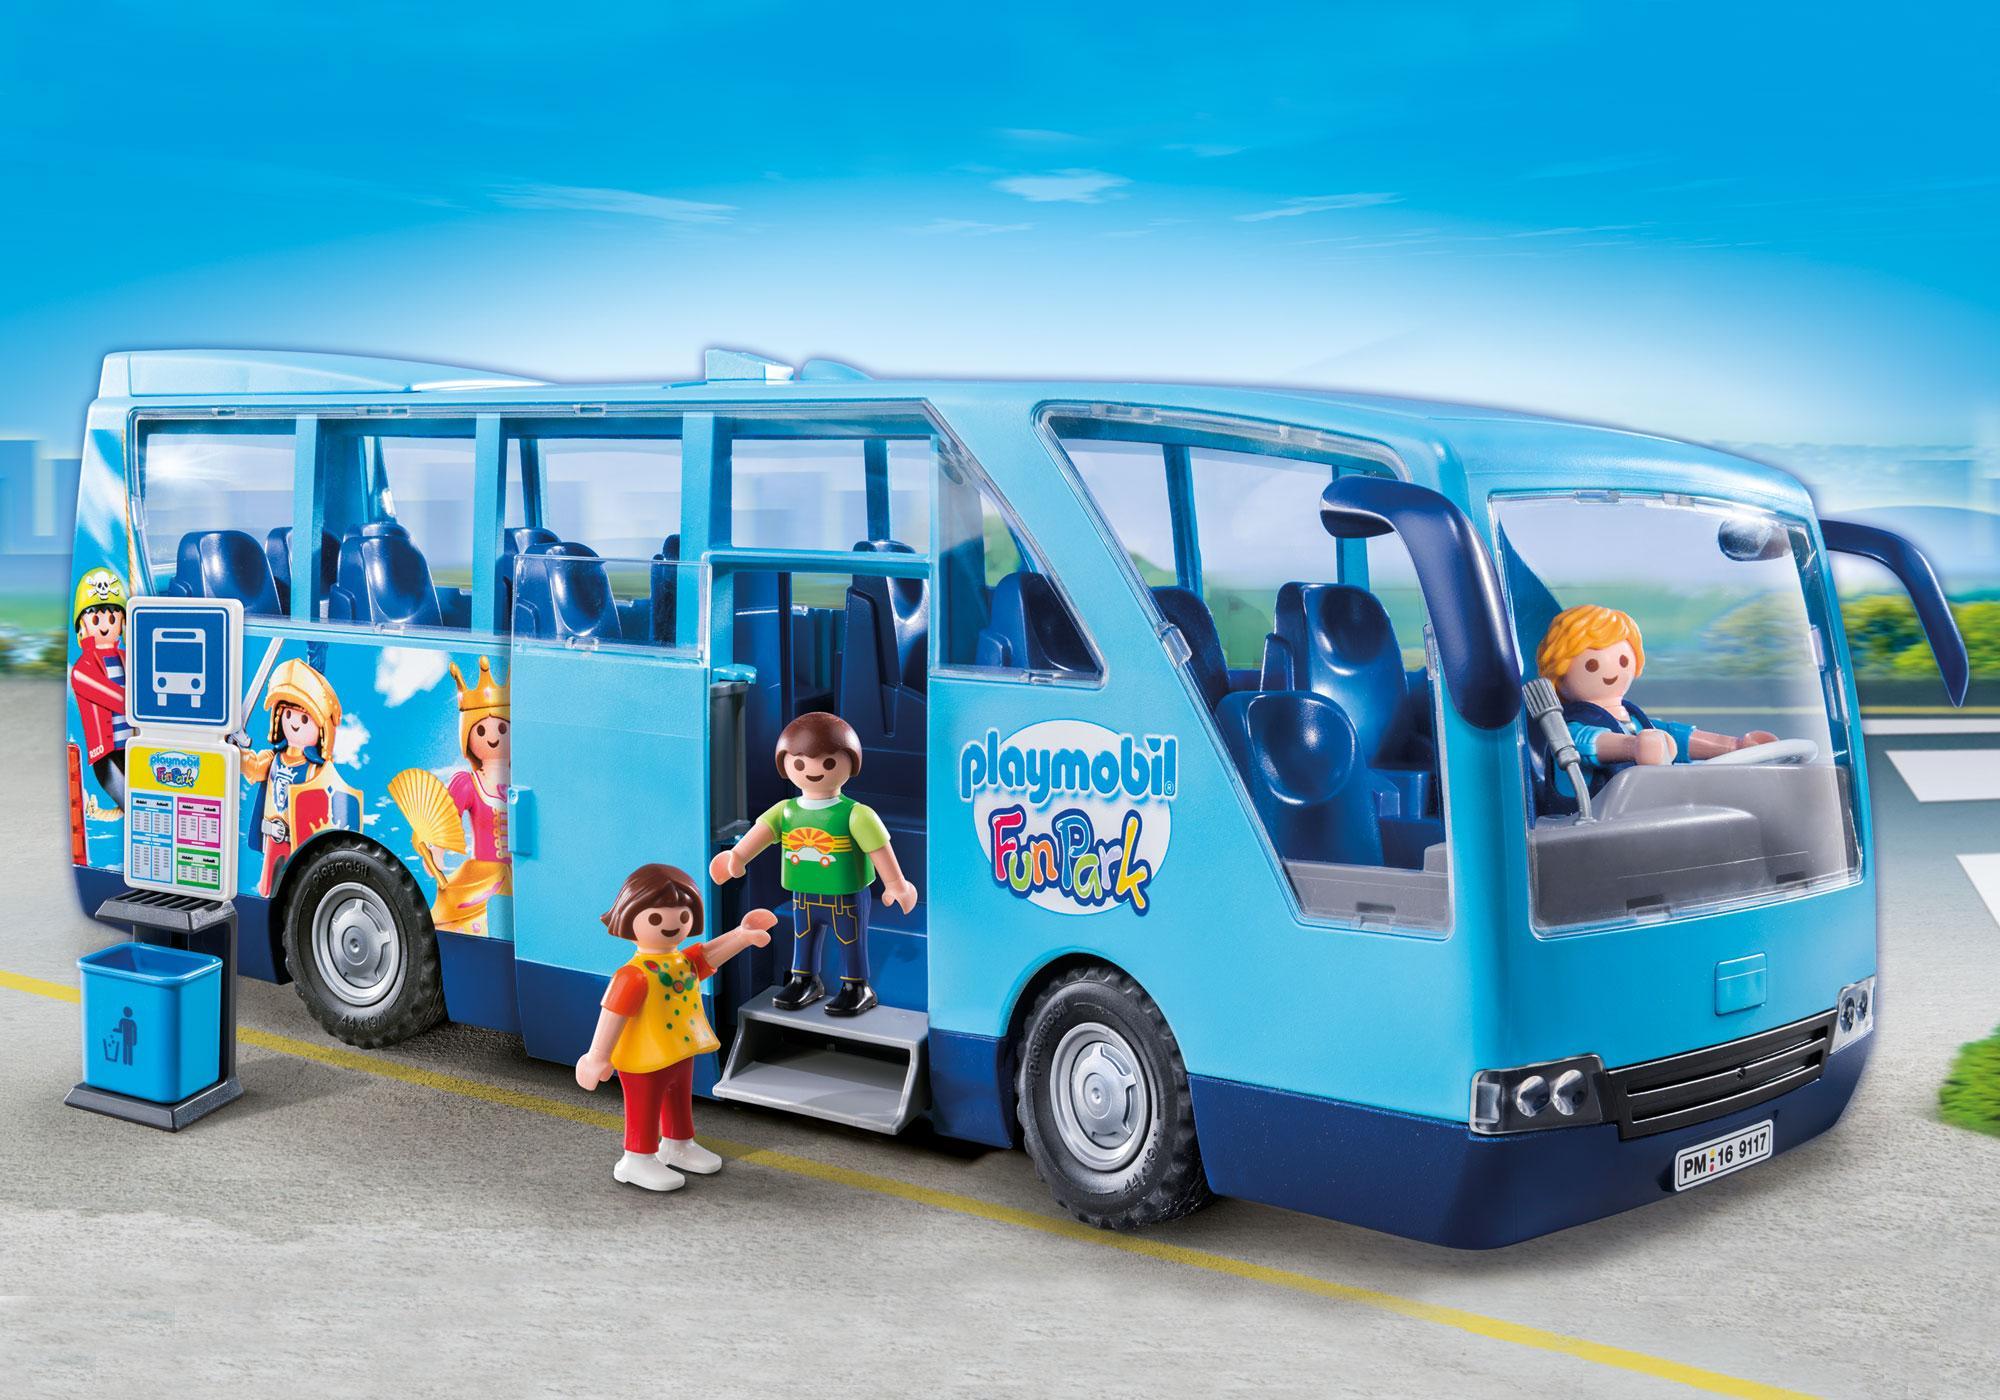 http://media.playmobil.com/i/playmobil/9117_product_detail/PLAYMOBIL-FunPark Schulbus